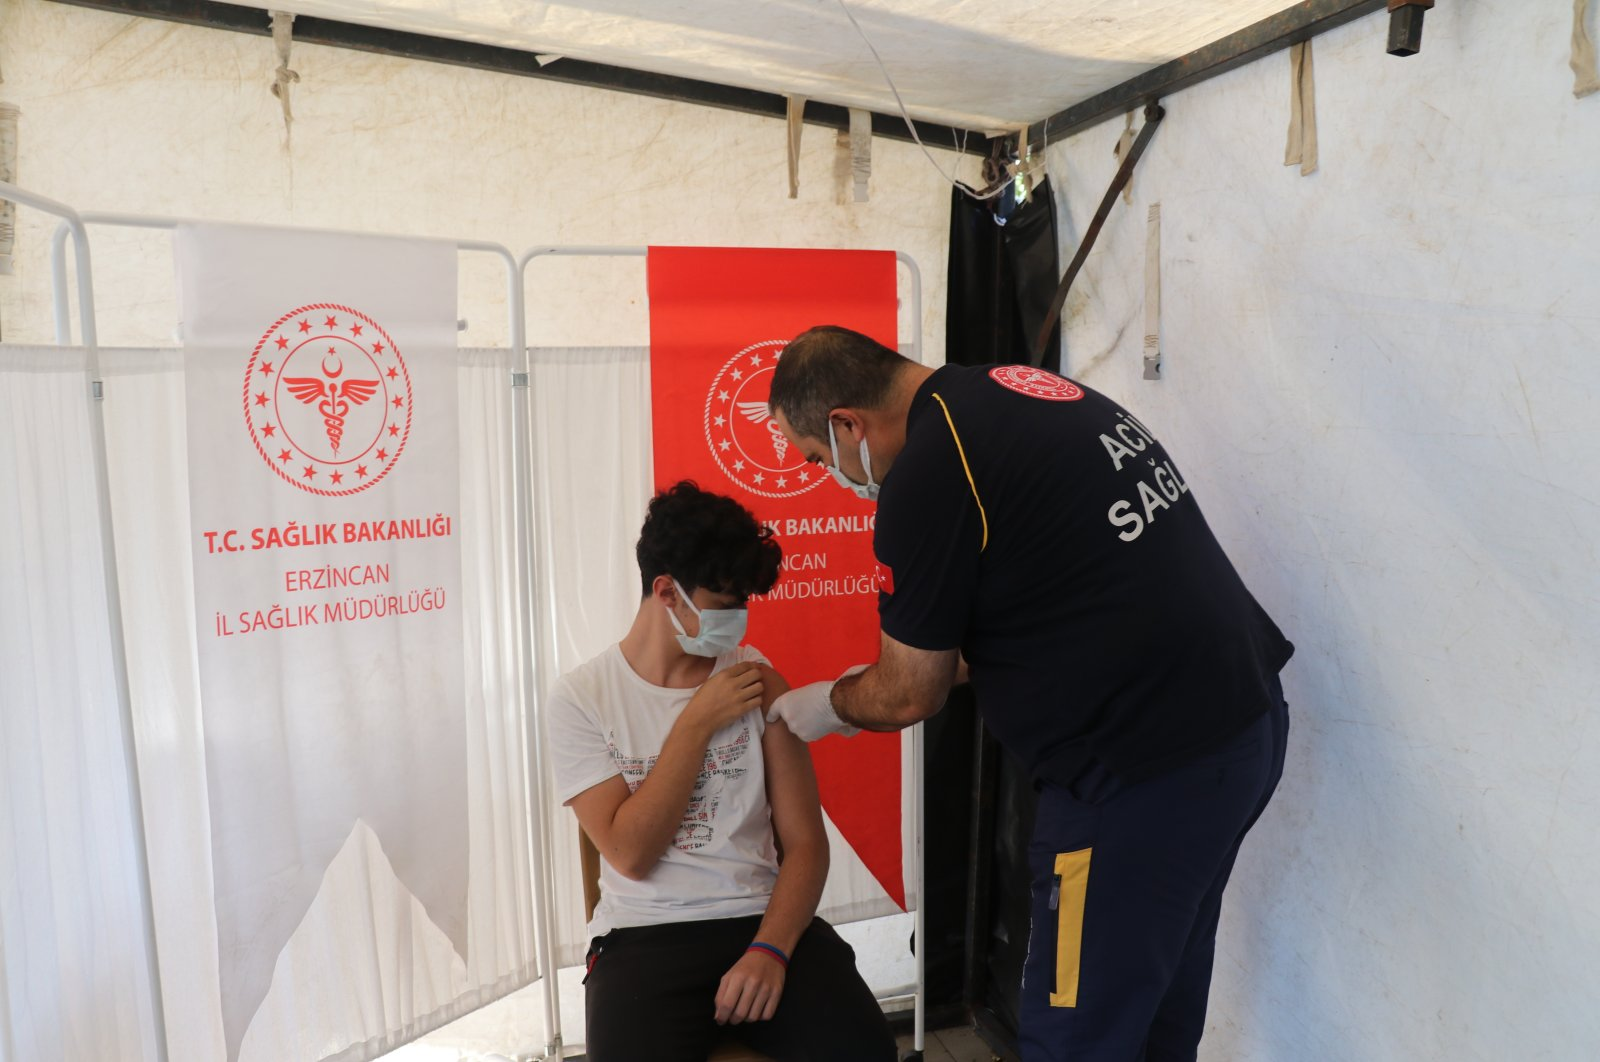 Erkan Hirik, head of local Directorate of Health, vaccinates his son Gün, in Erzincan, eastern Turkey, Aug. 28, 2021. (AA PHOTO)